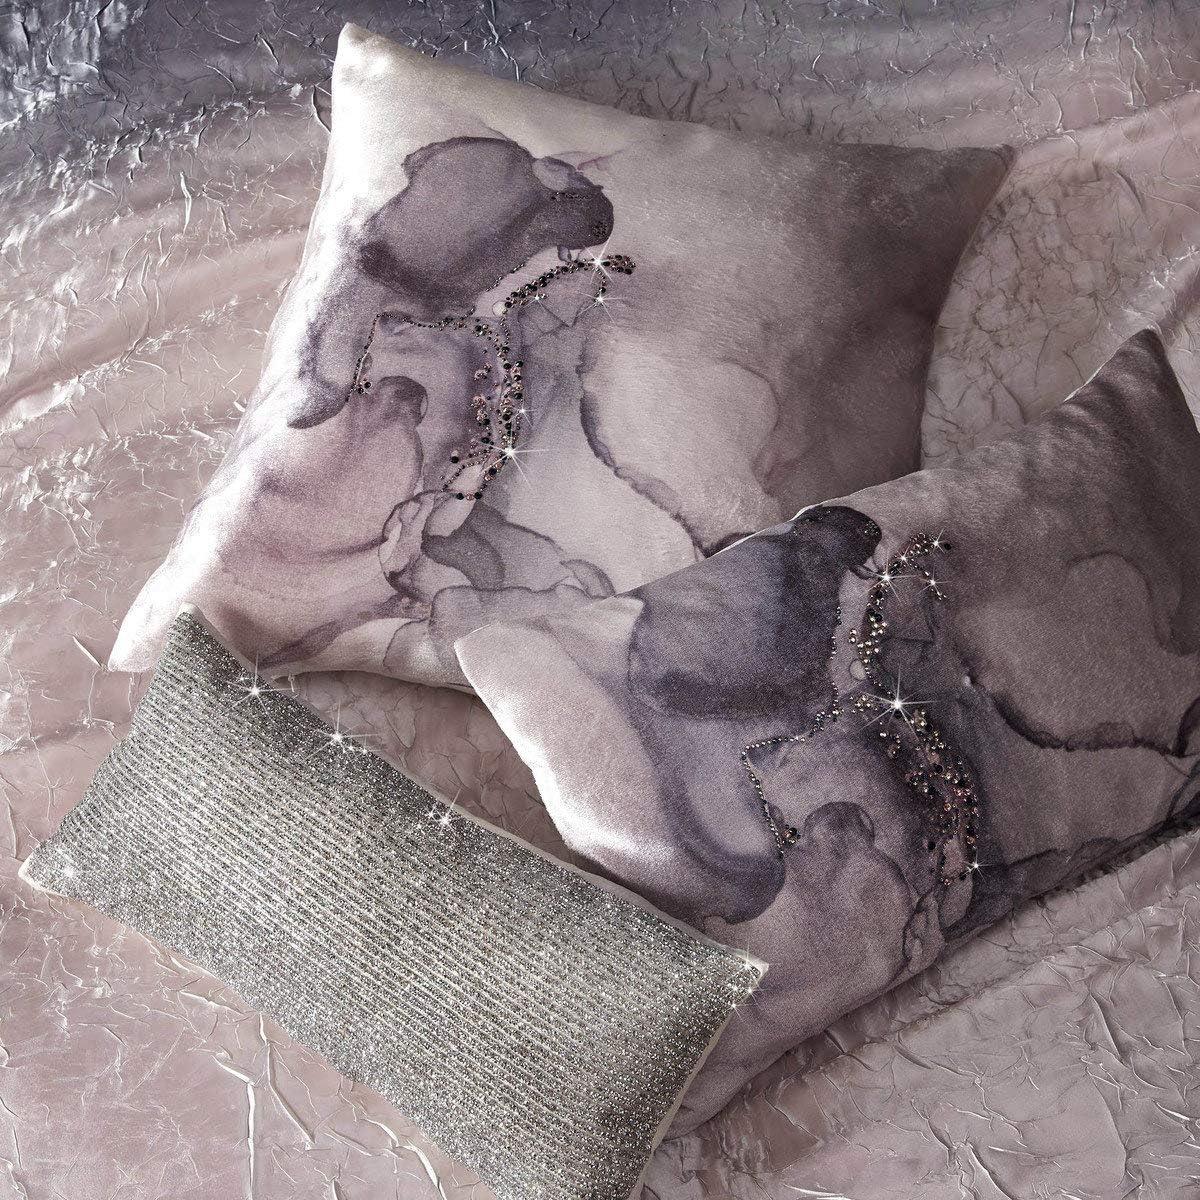 European Square 65x65cm Rita Ora Portobello Bedding Bedding Pillowcase Set of 2